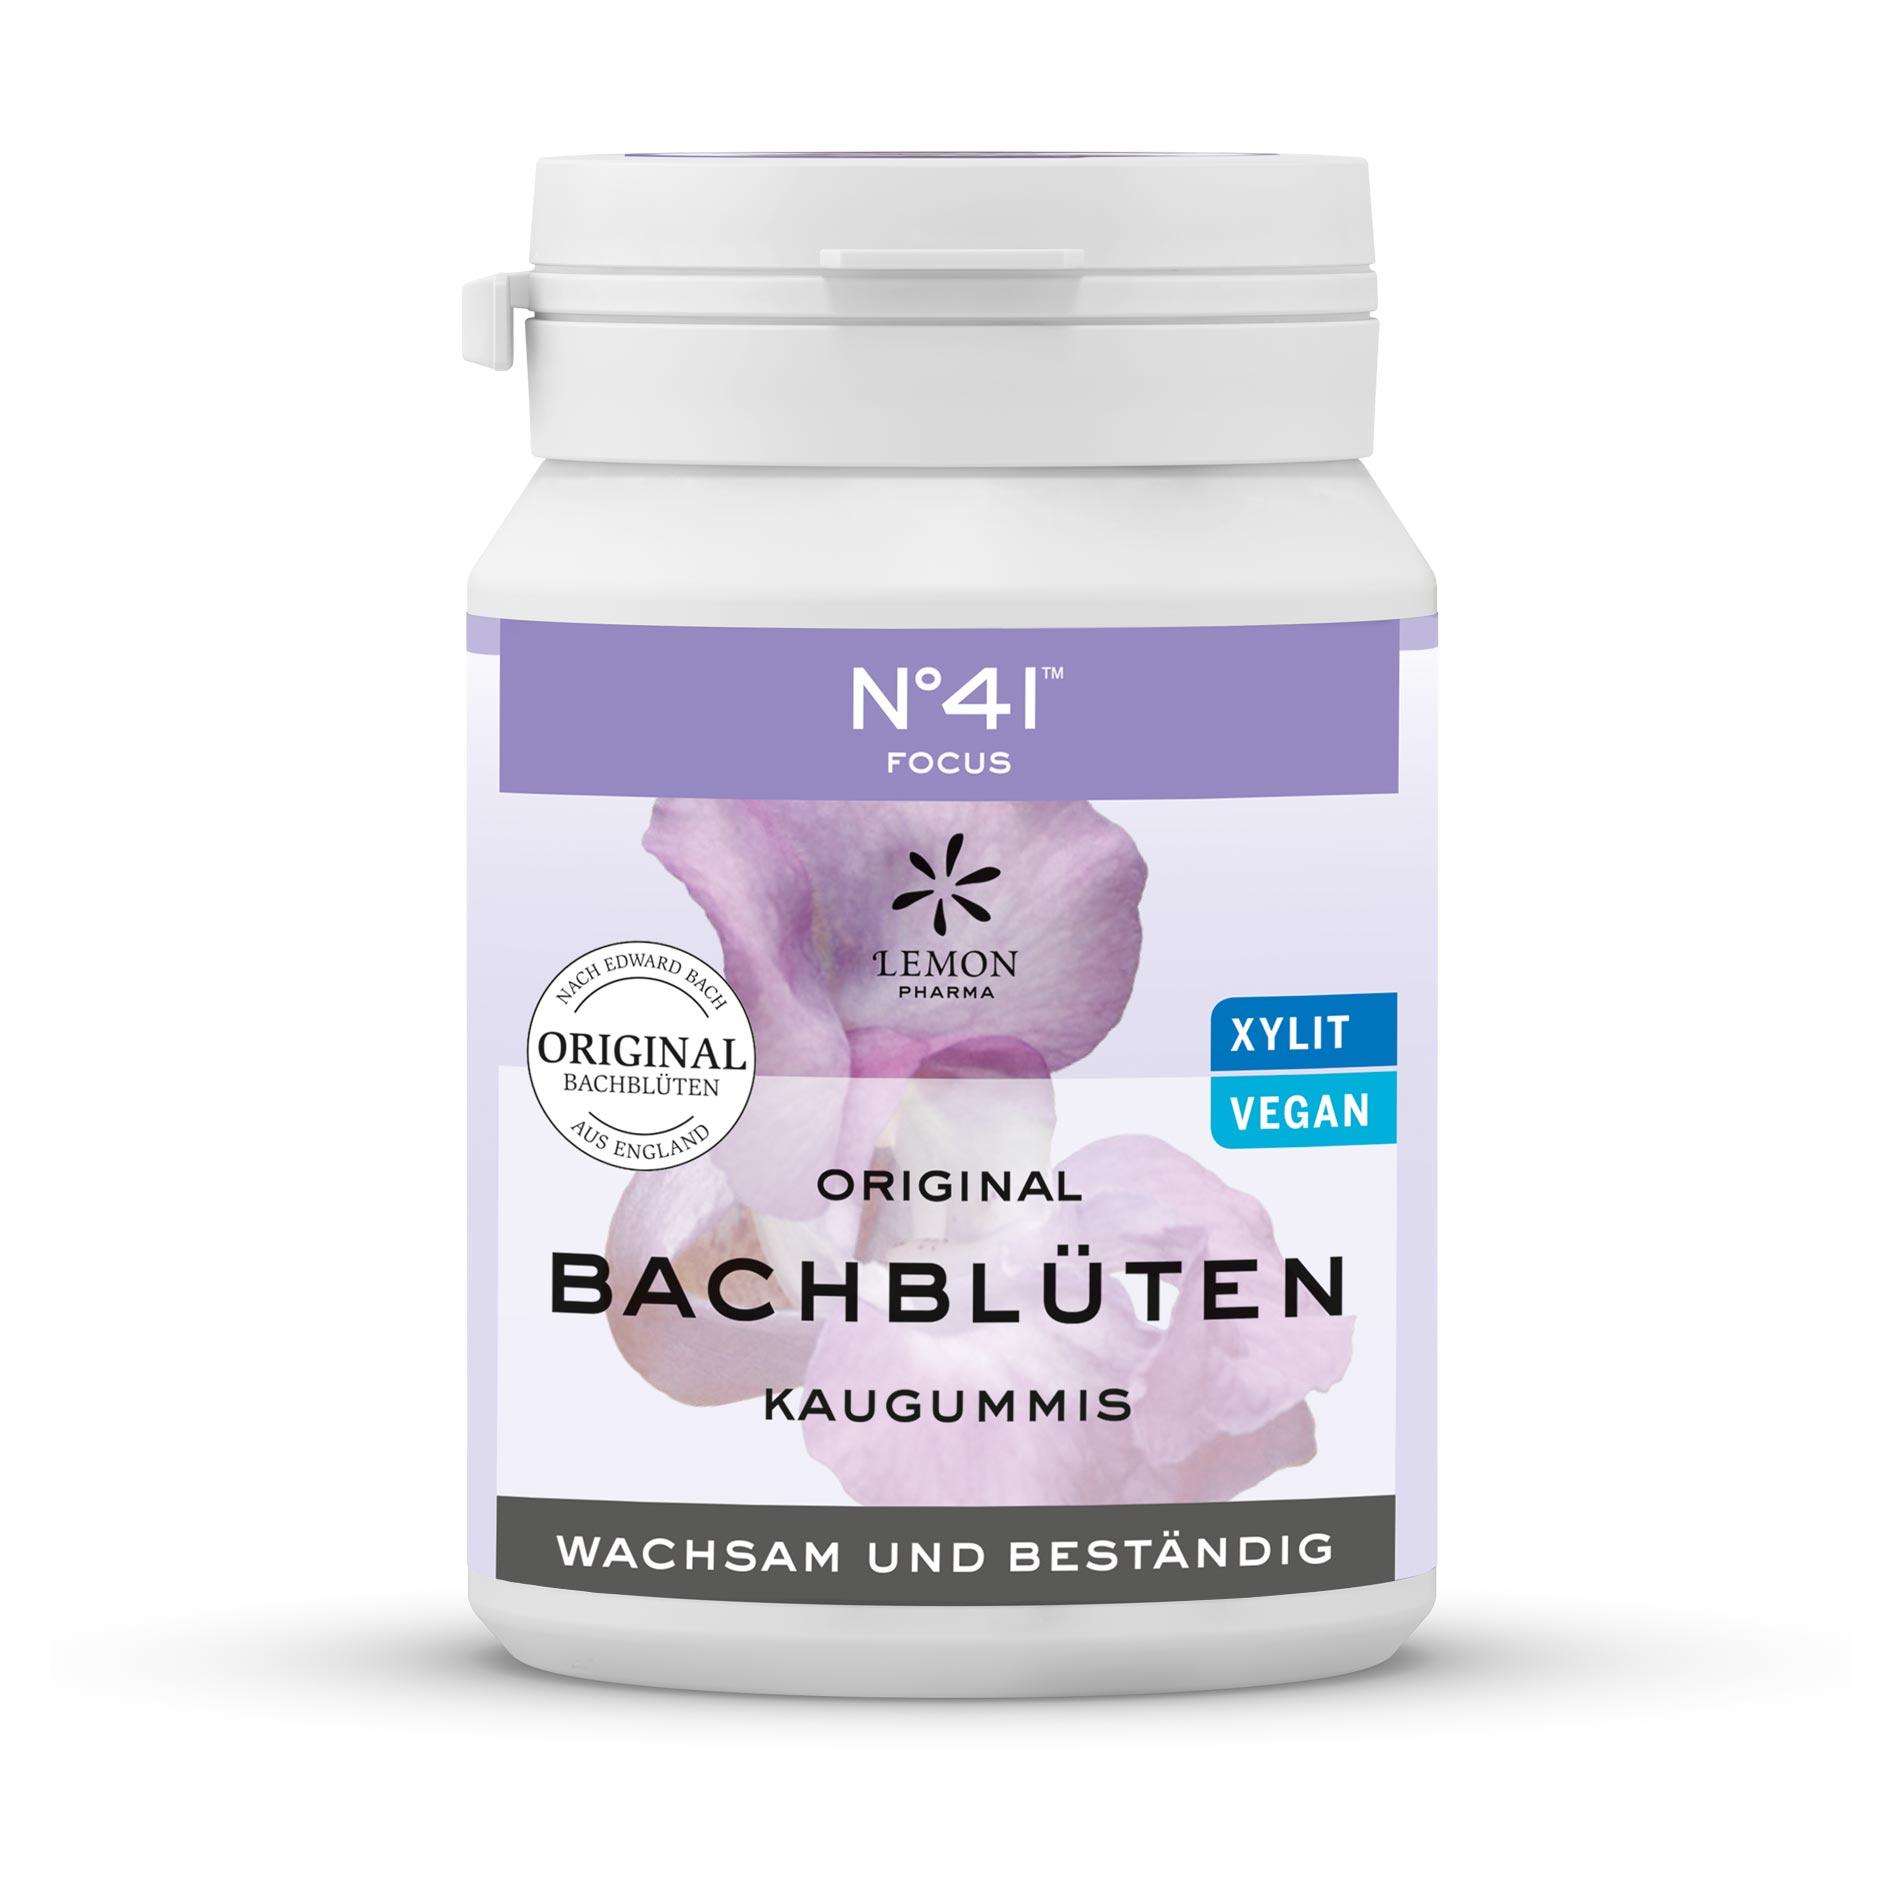 Kaugummi 41 Fokus Lemon Pharma Original Bachblüte Bach flowers Wachsam und Beständig Xylit Vegan